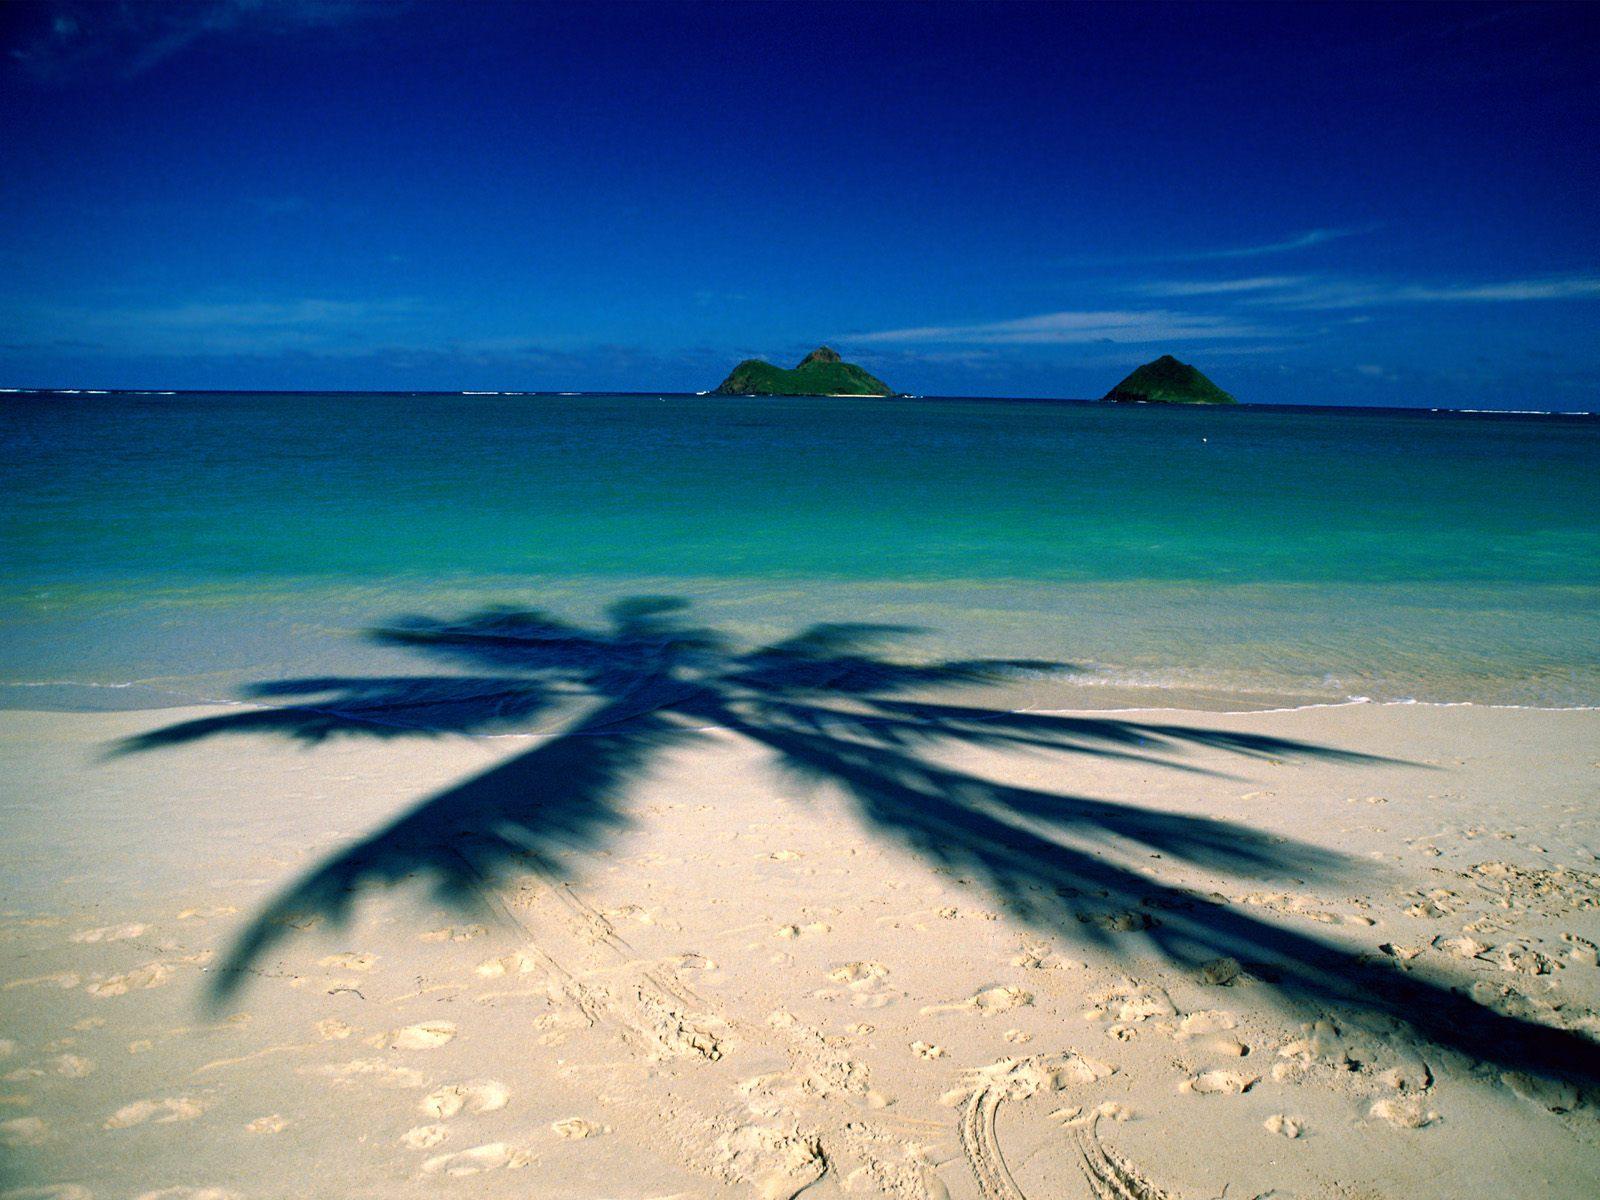 http://3.bp.blogspot.com/_Itom5lvNXPM/TELtnr4Av4I/AAAAAAAAC74/O4jFVlEBU9w/s1600/Lanikai+Beach,+Oahu,+Hawaii.jpg